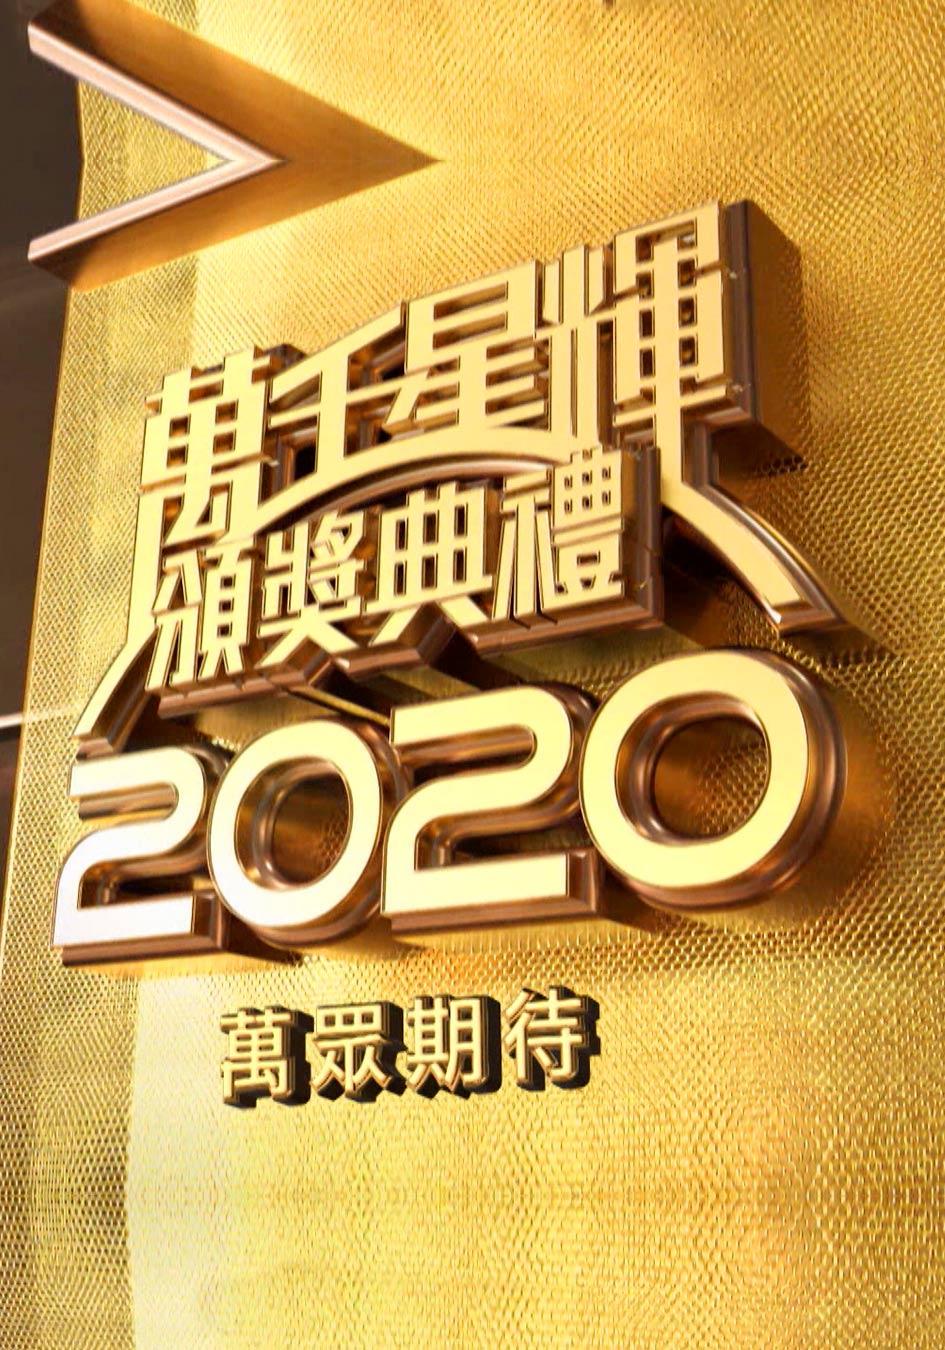 萬千星輝頒獎典禮2020-TVB Awards Presentation 2020